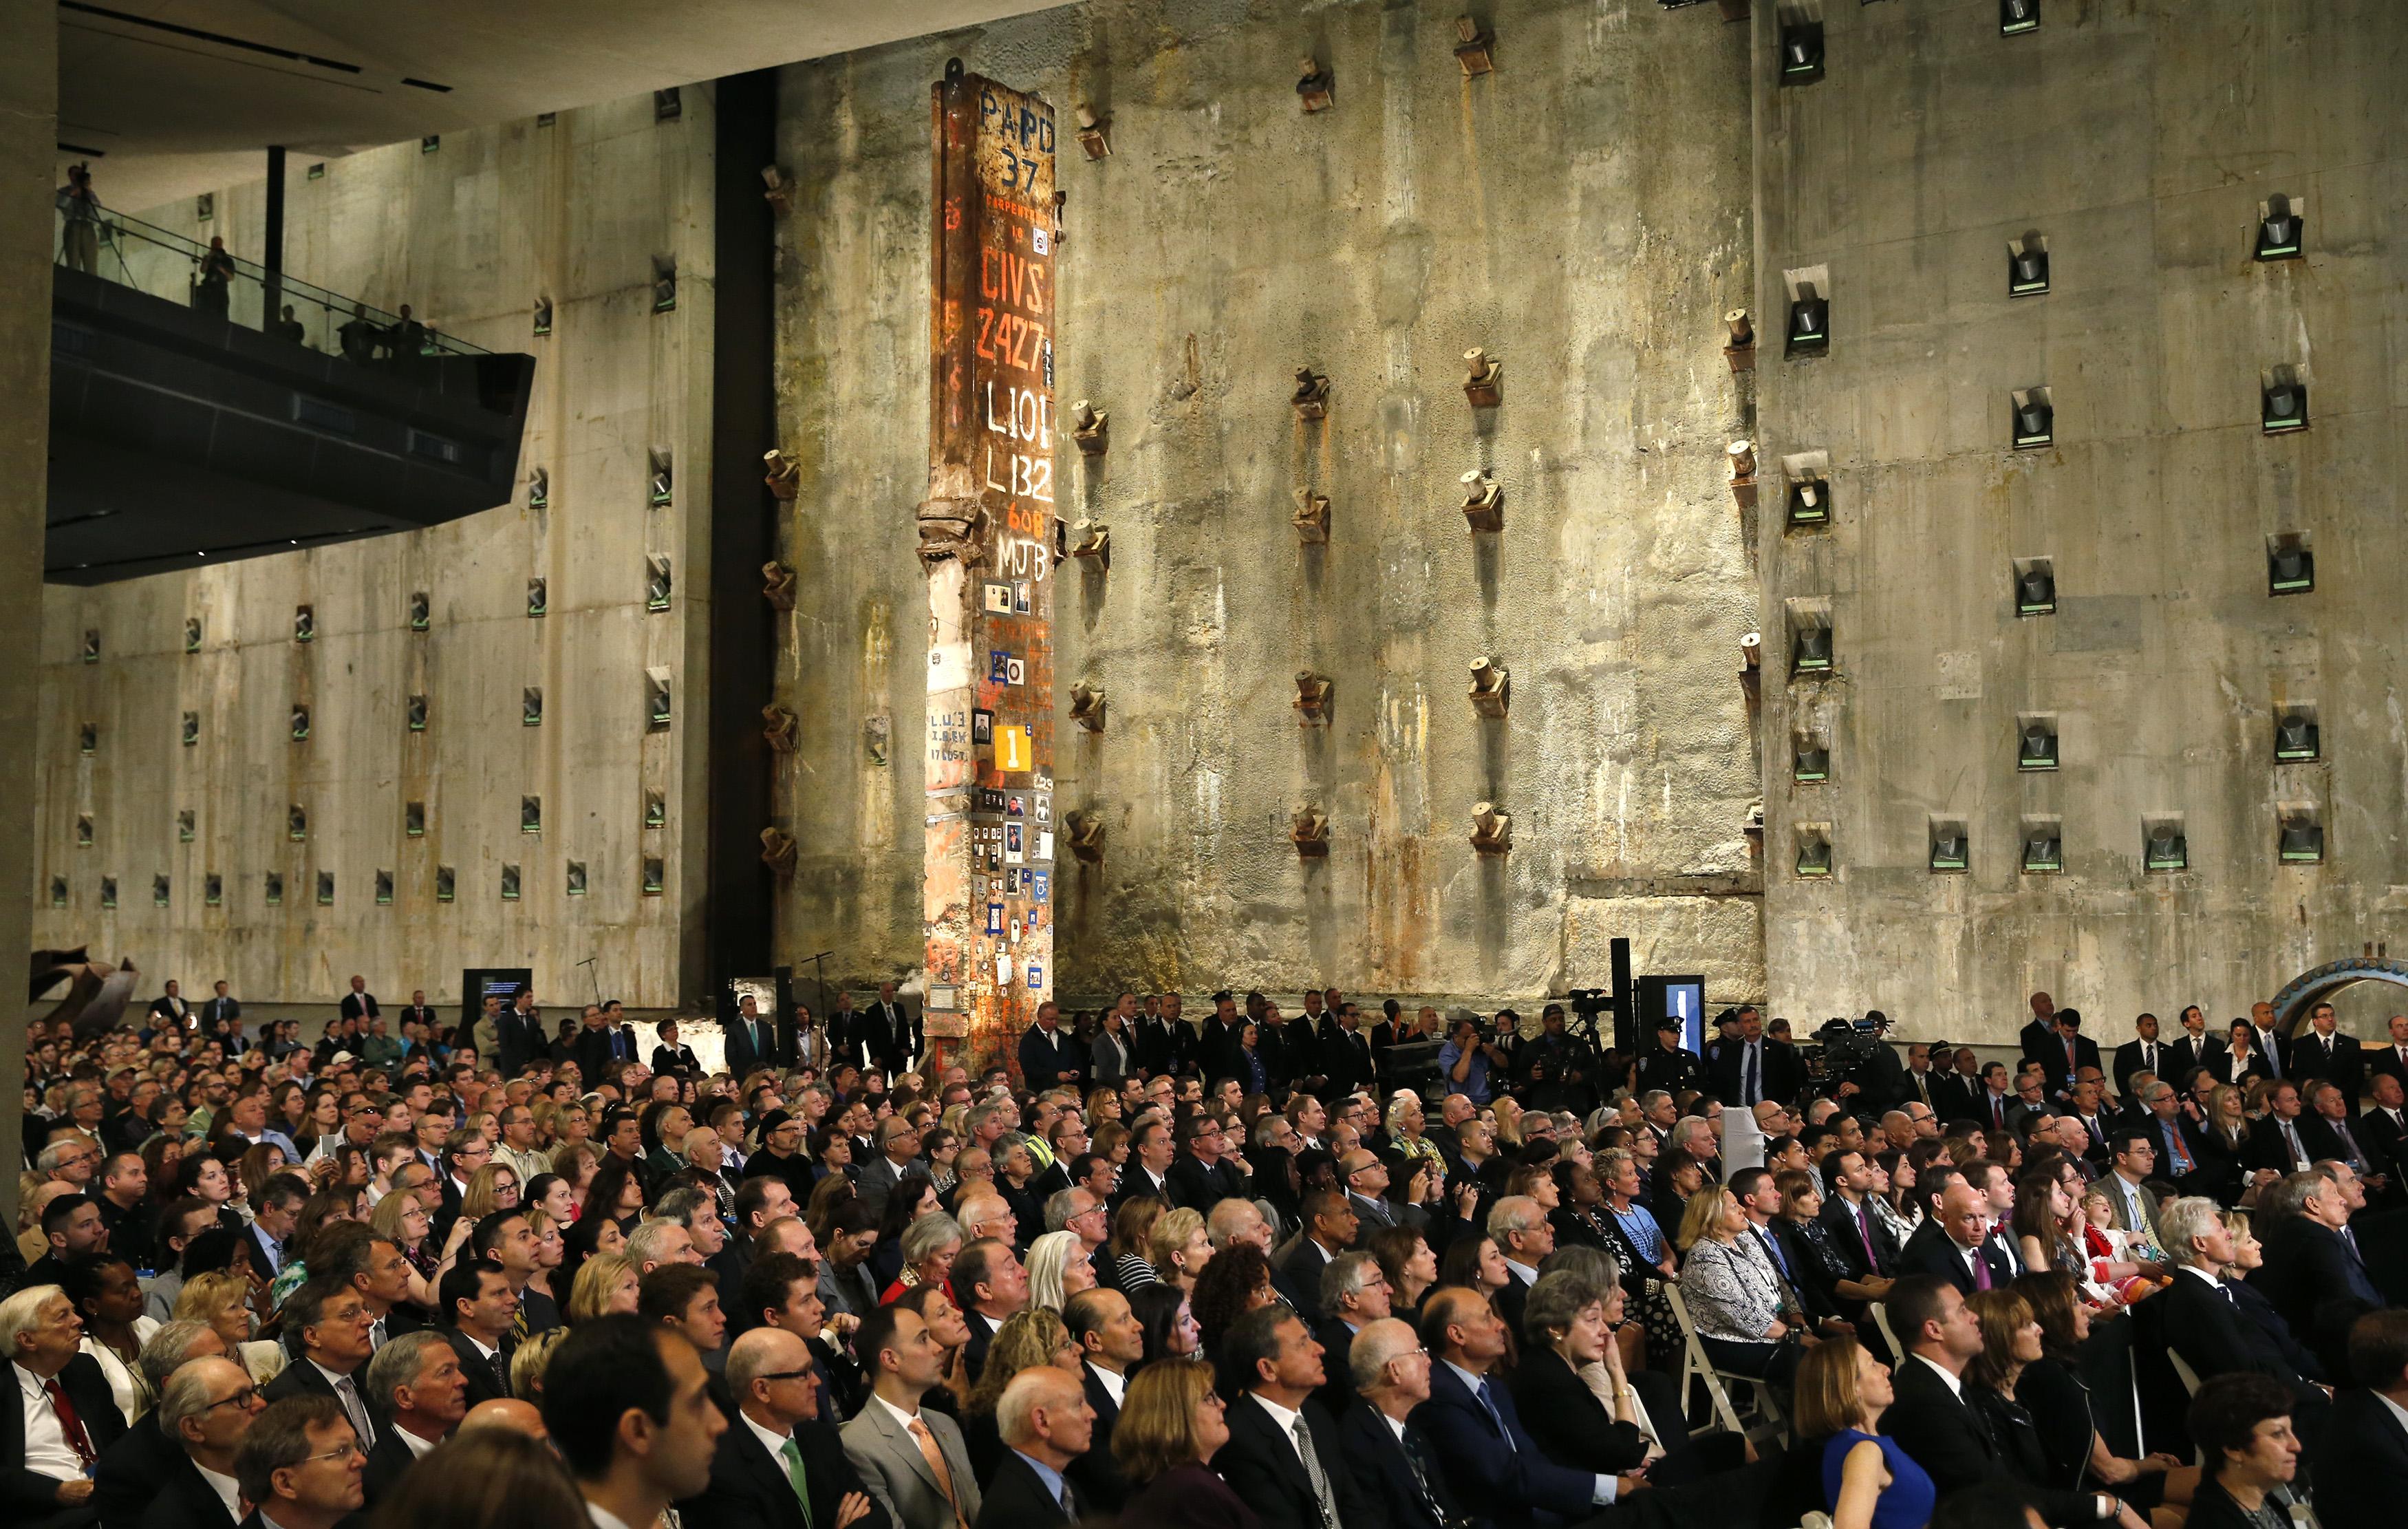 The audience (Mike Segar/REUTERS)